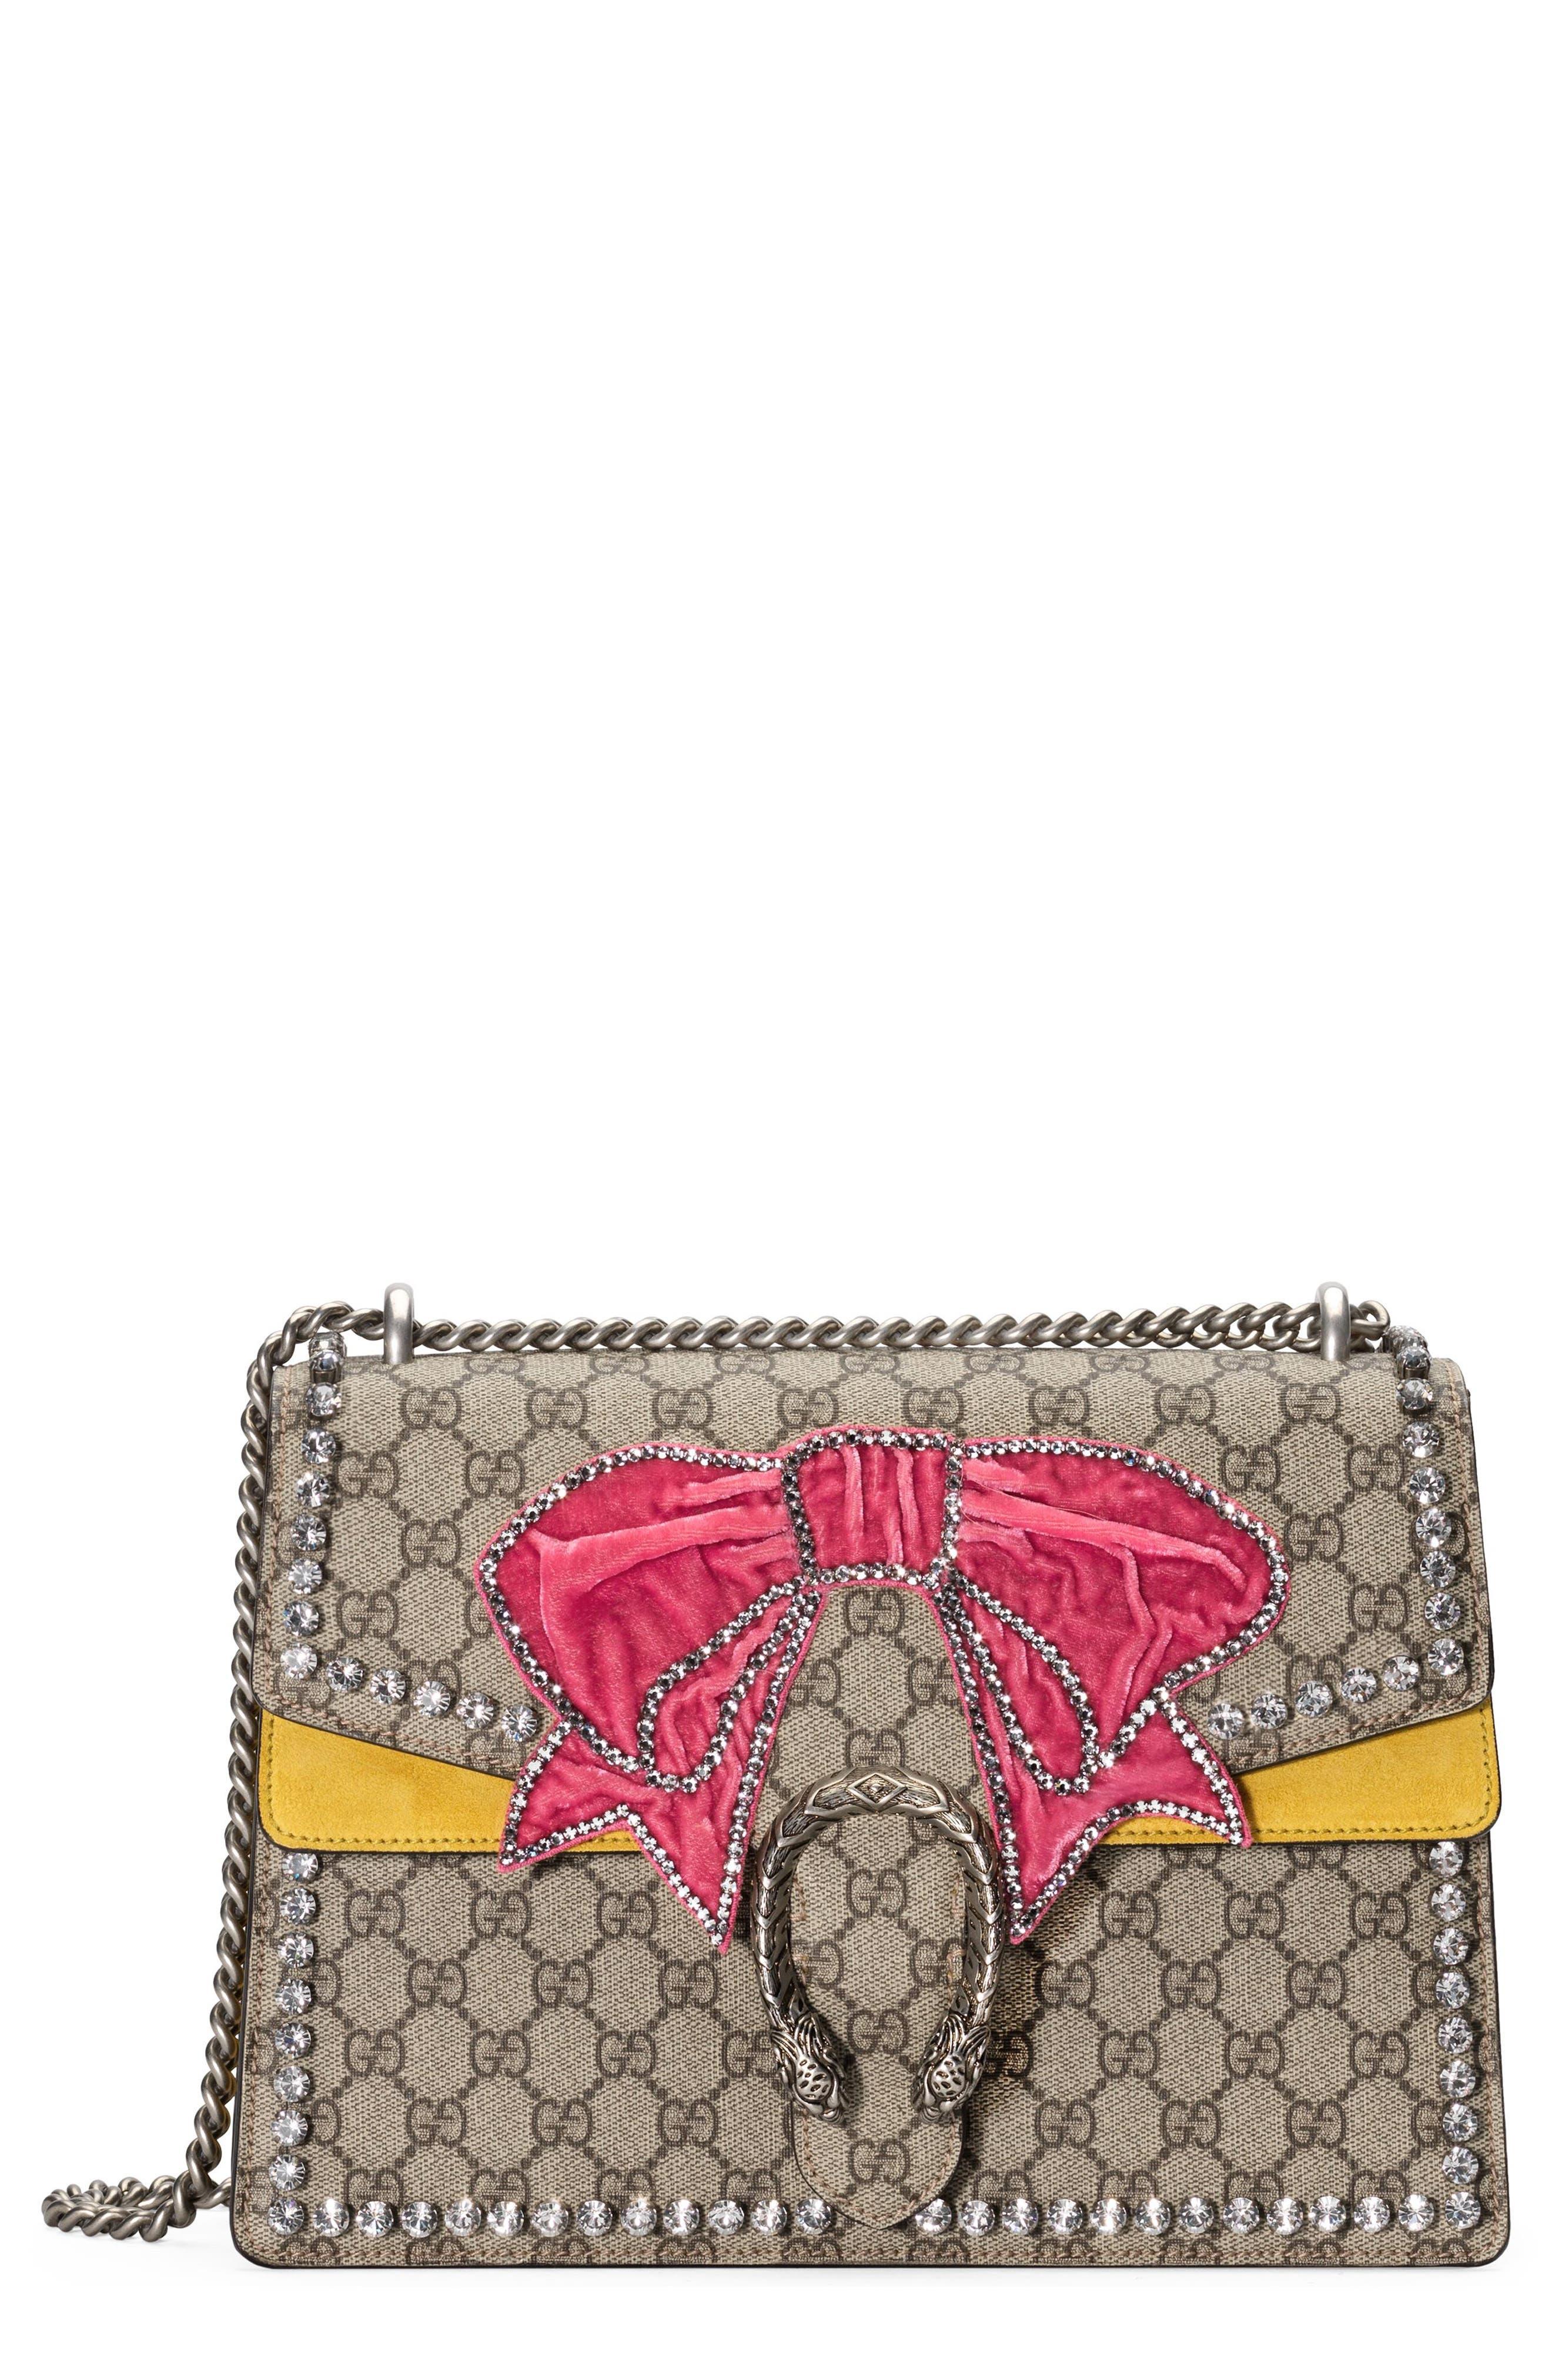 Medium Dionysus GG Supreme Canvas Shoulder Bag,                             Main thumbnail 1, color,                             Beige Ebony Crystal